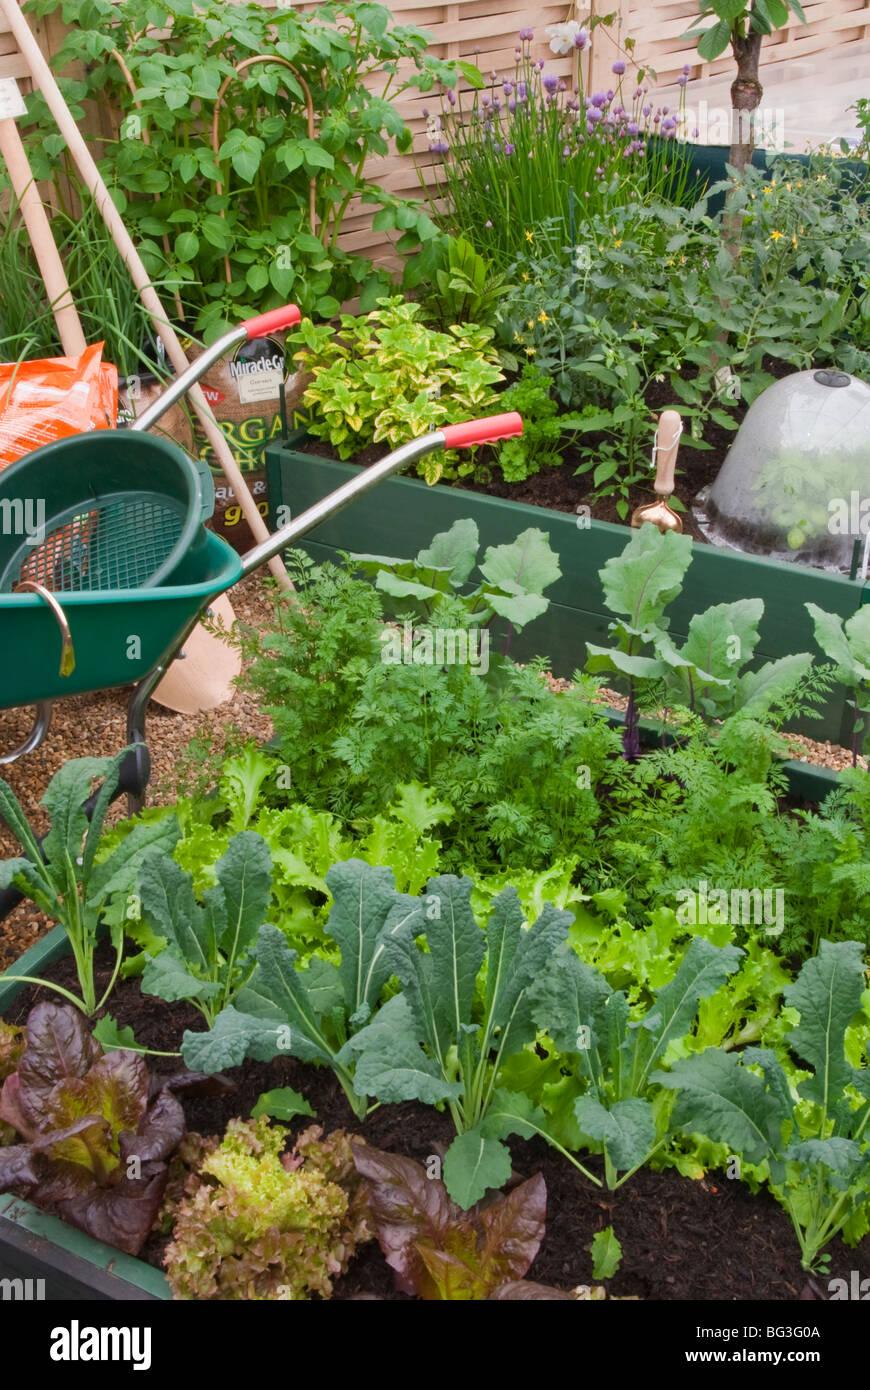 Vegetable Garden Wheelbarrow Plants Raised Beds Tools